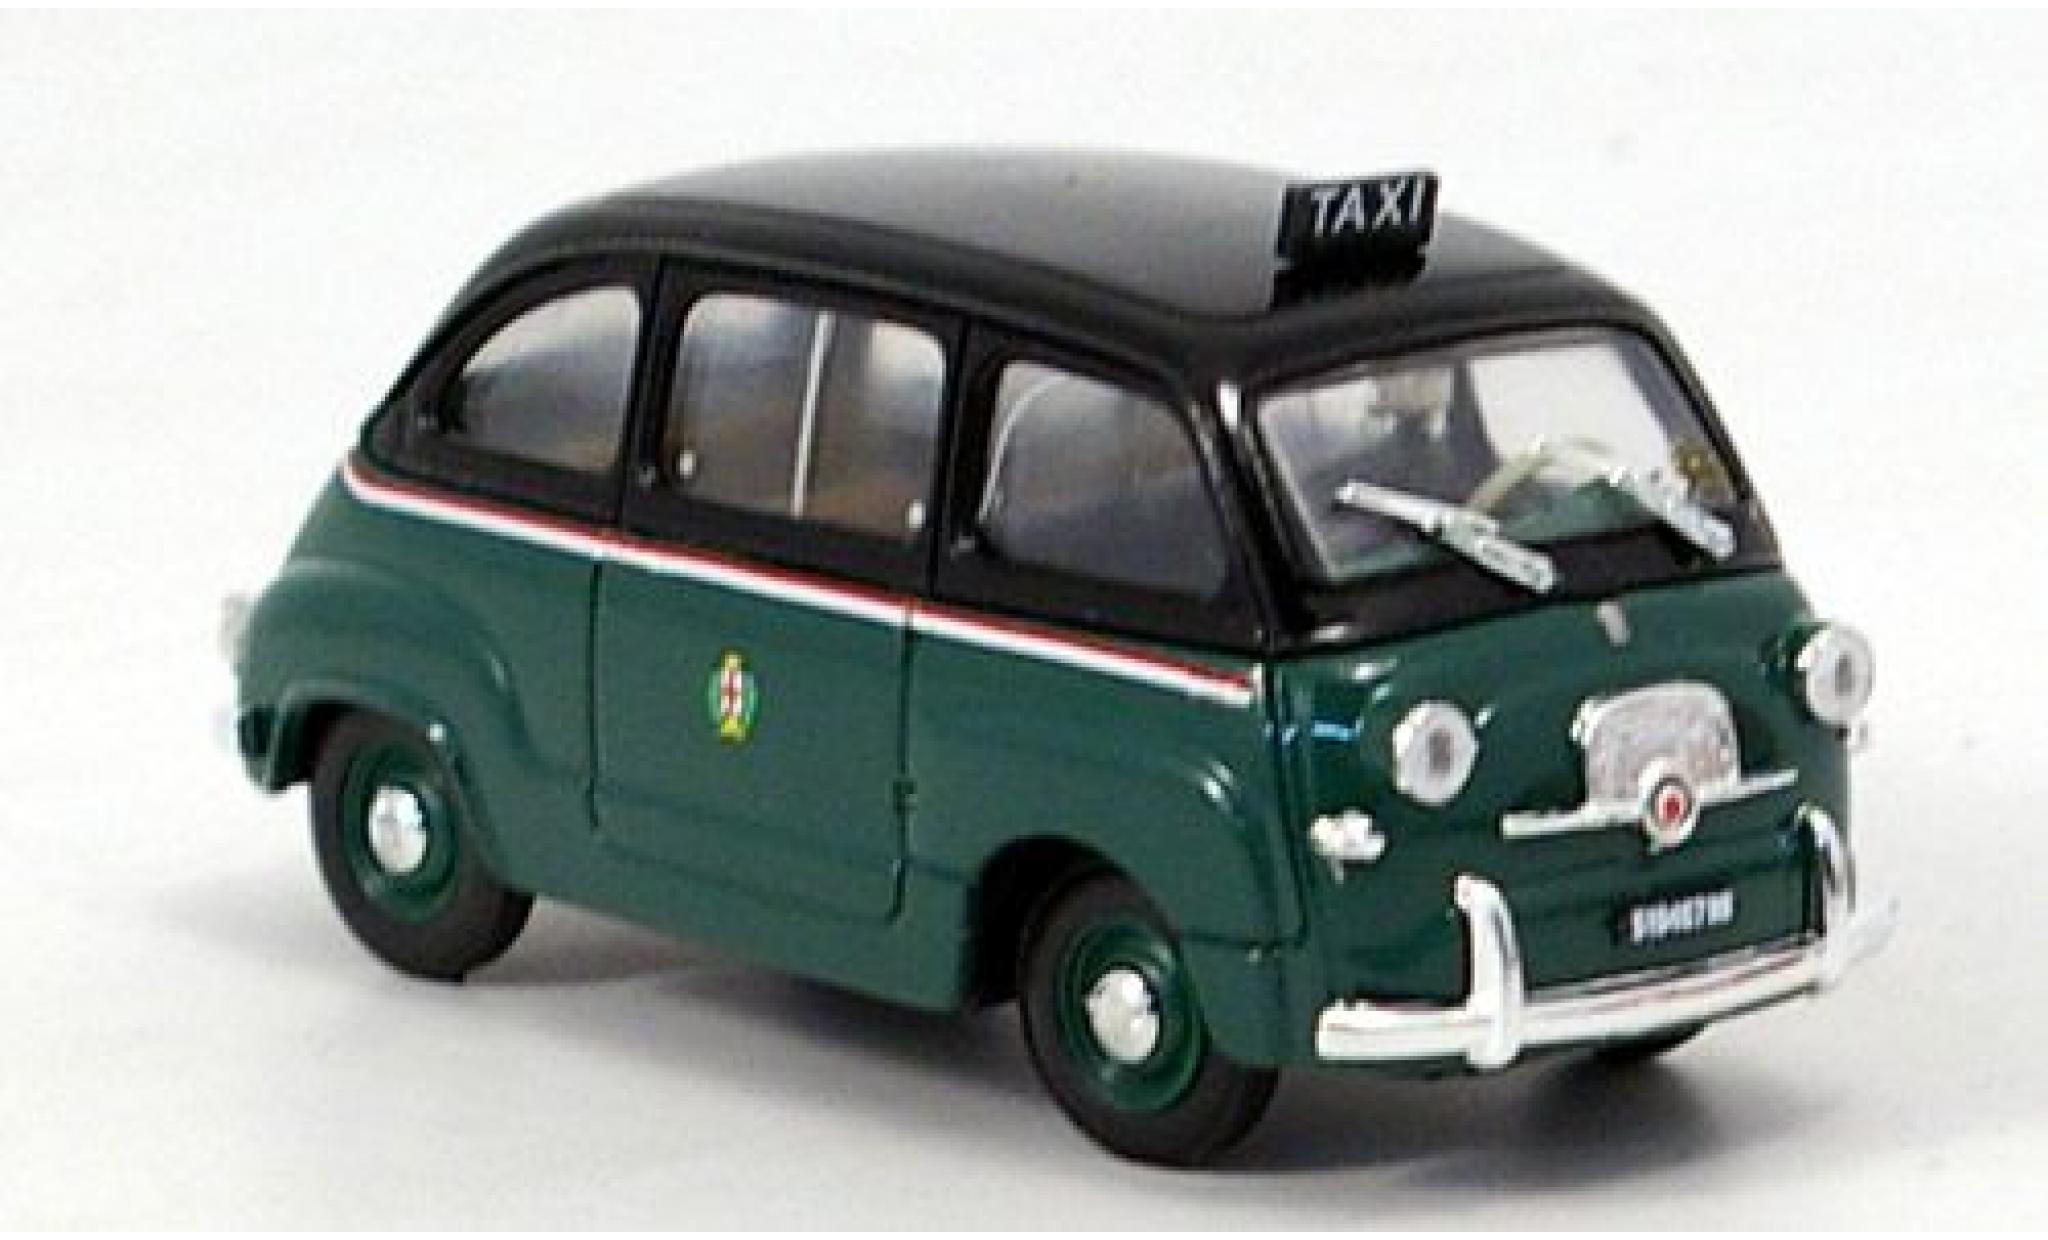 Fiat 600 1/43 Brumm Multipla Mailand 1956 Taxi